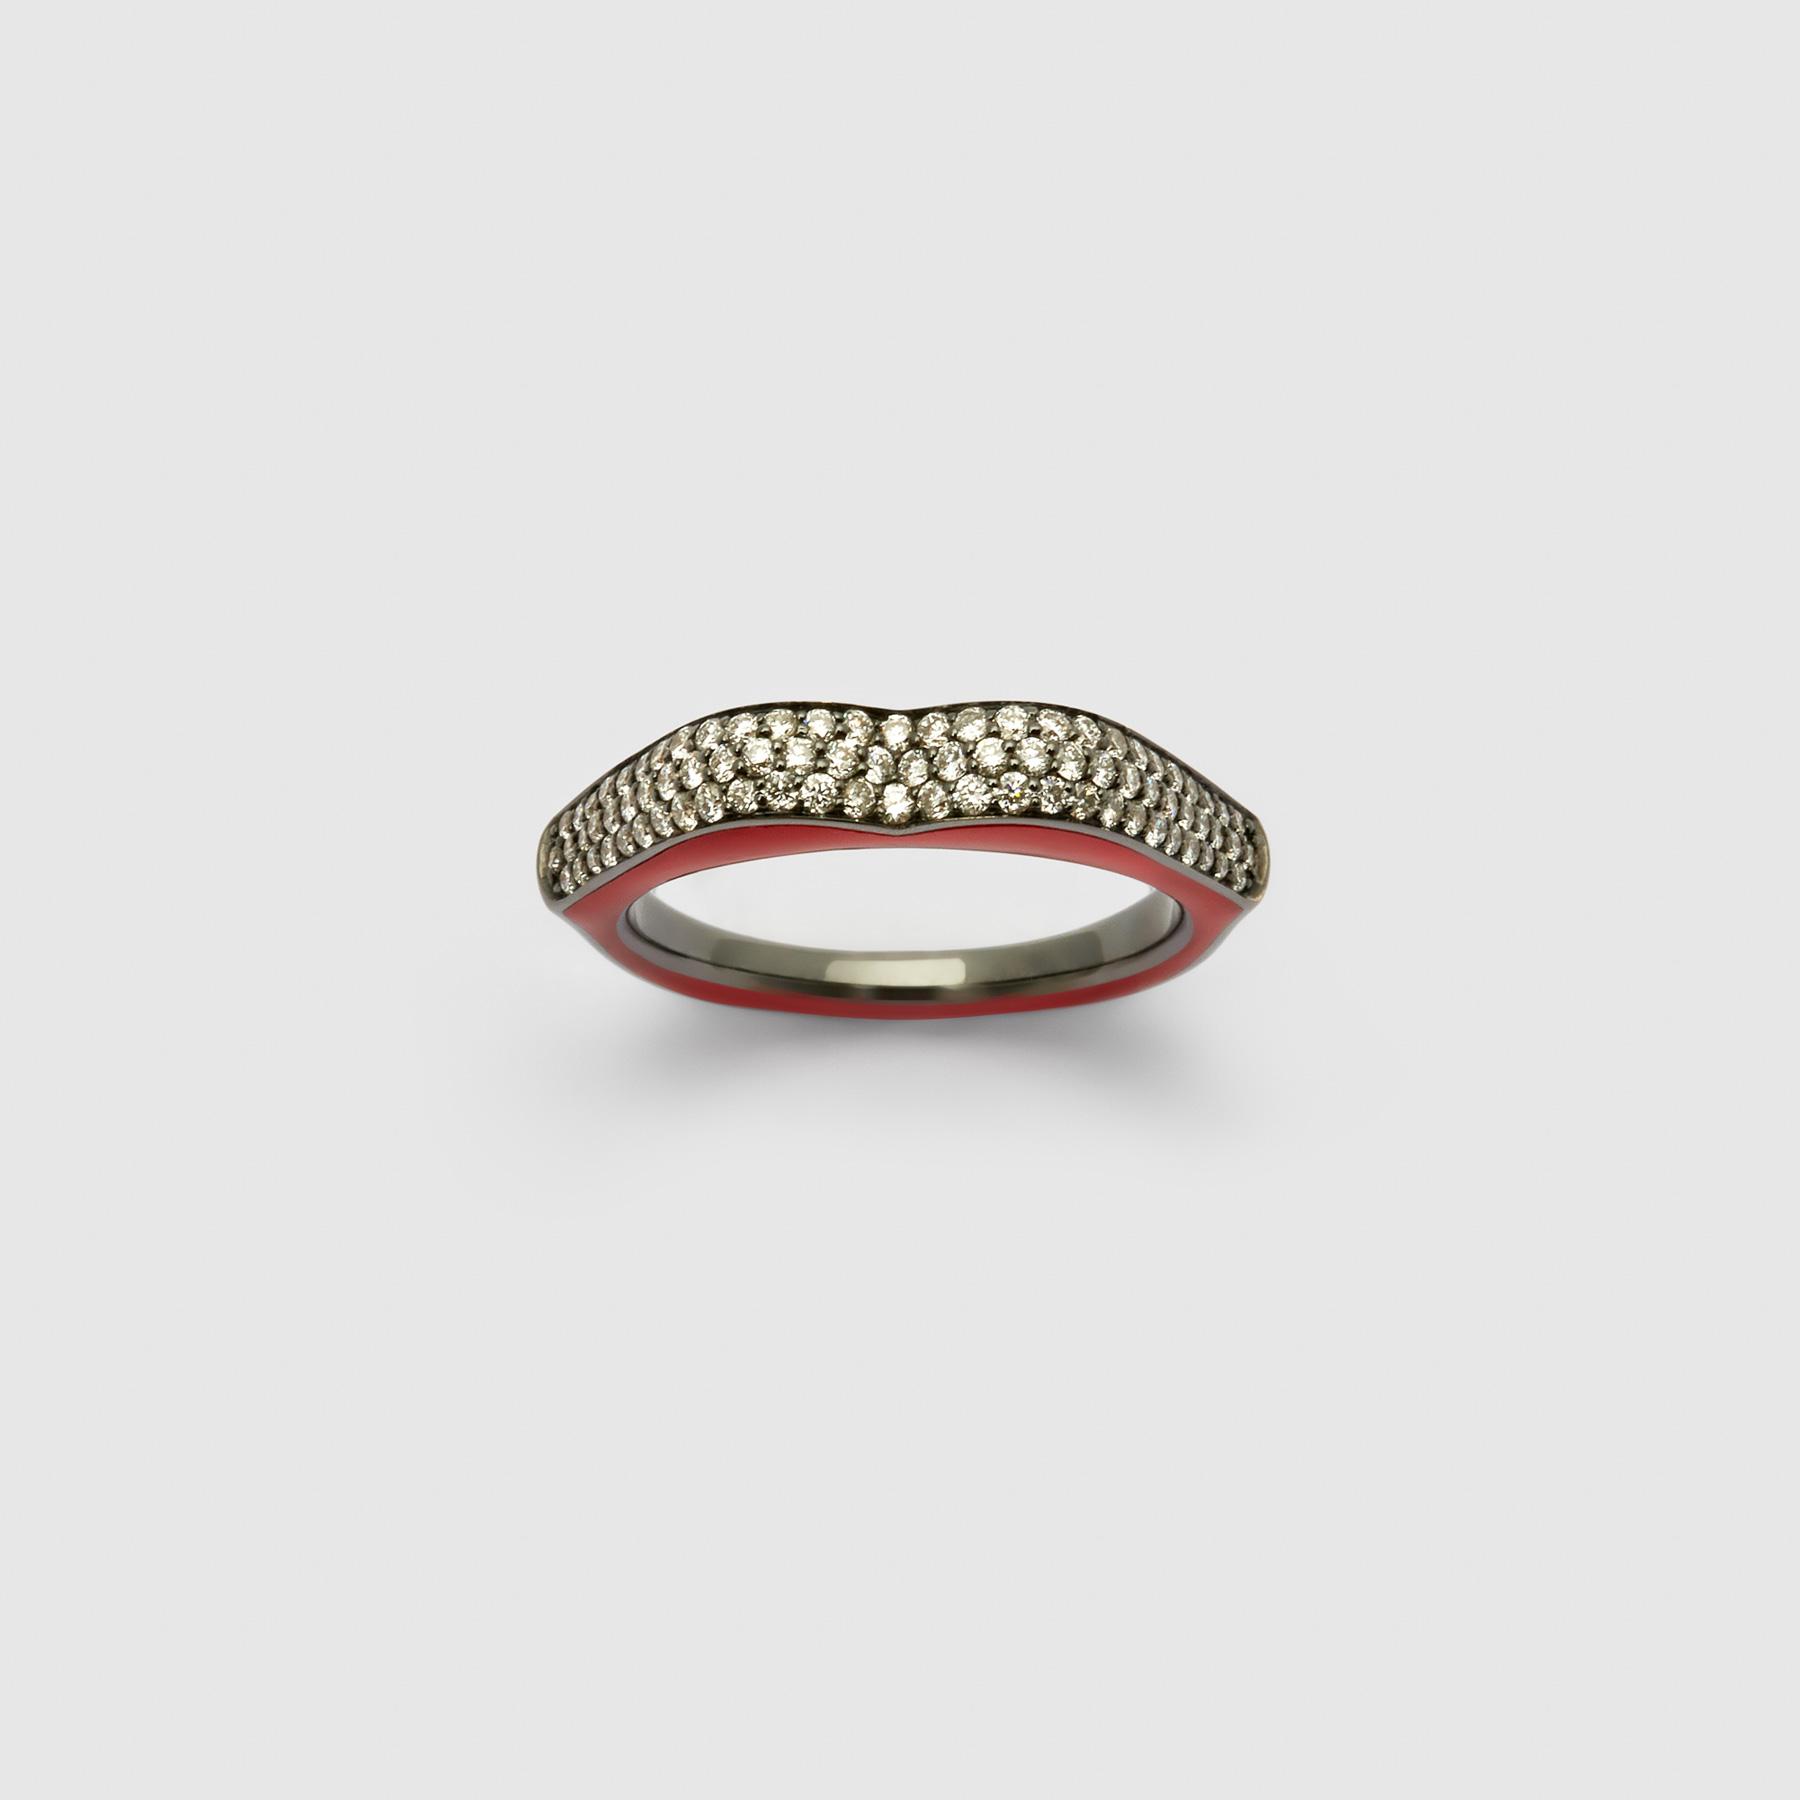 jewellery_10_sept--1302.jpg